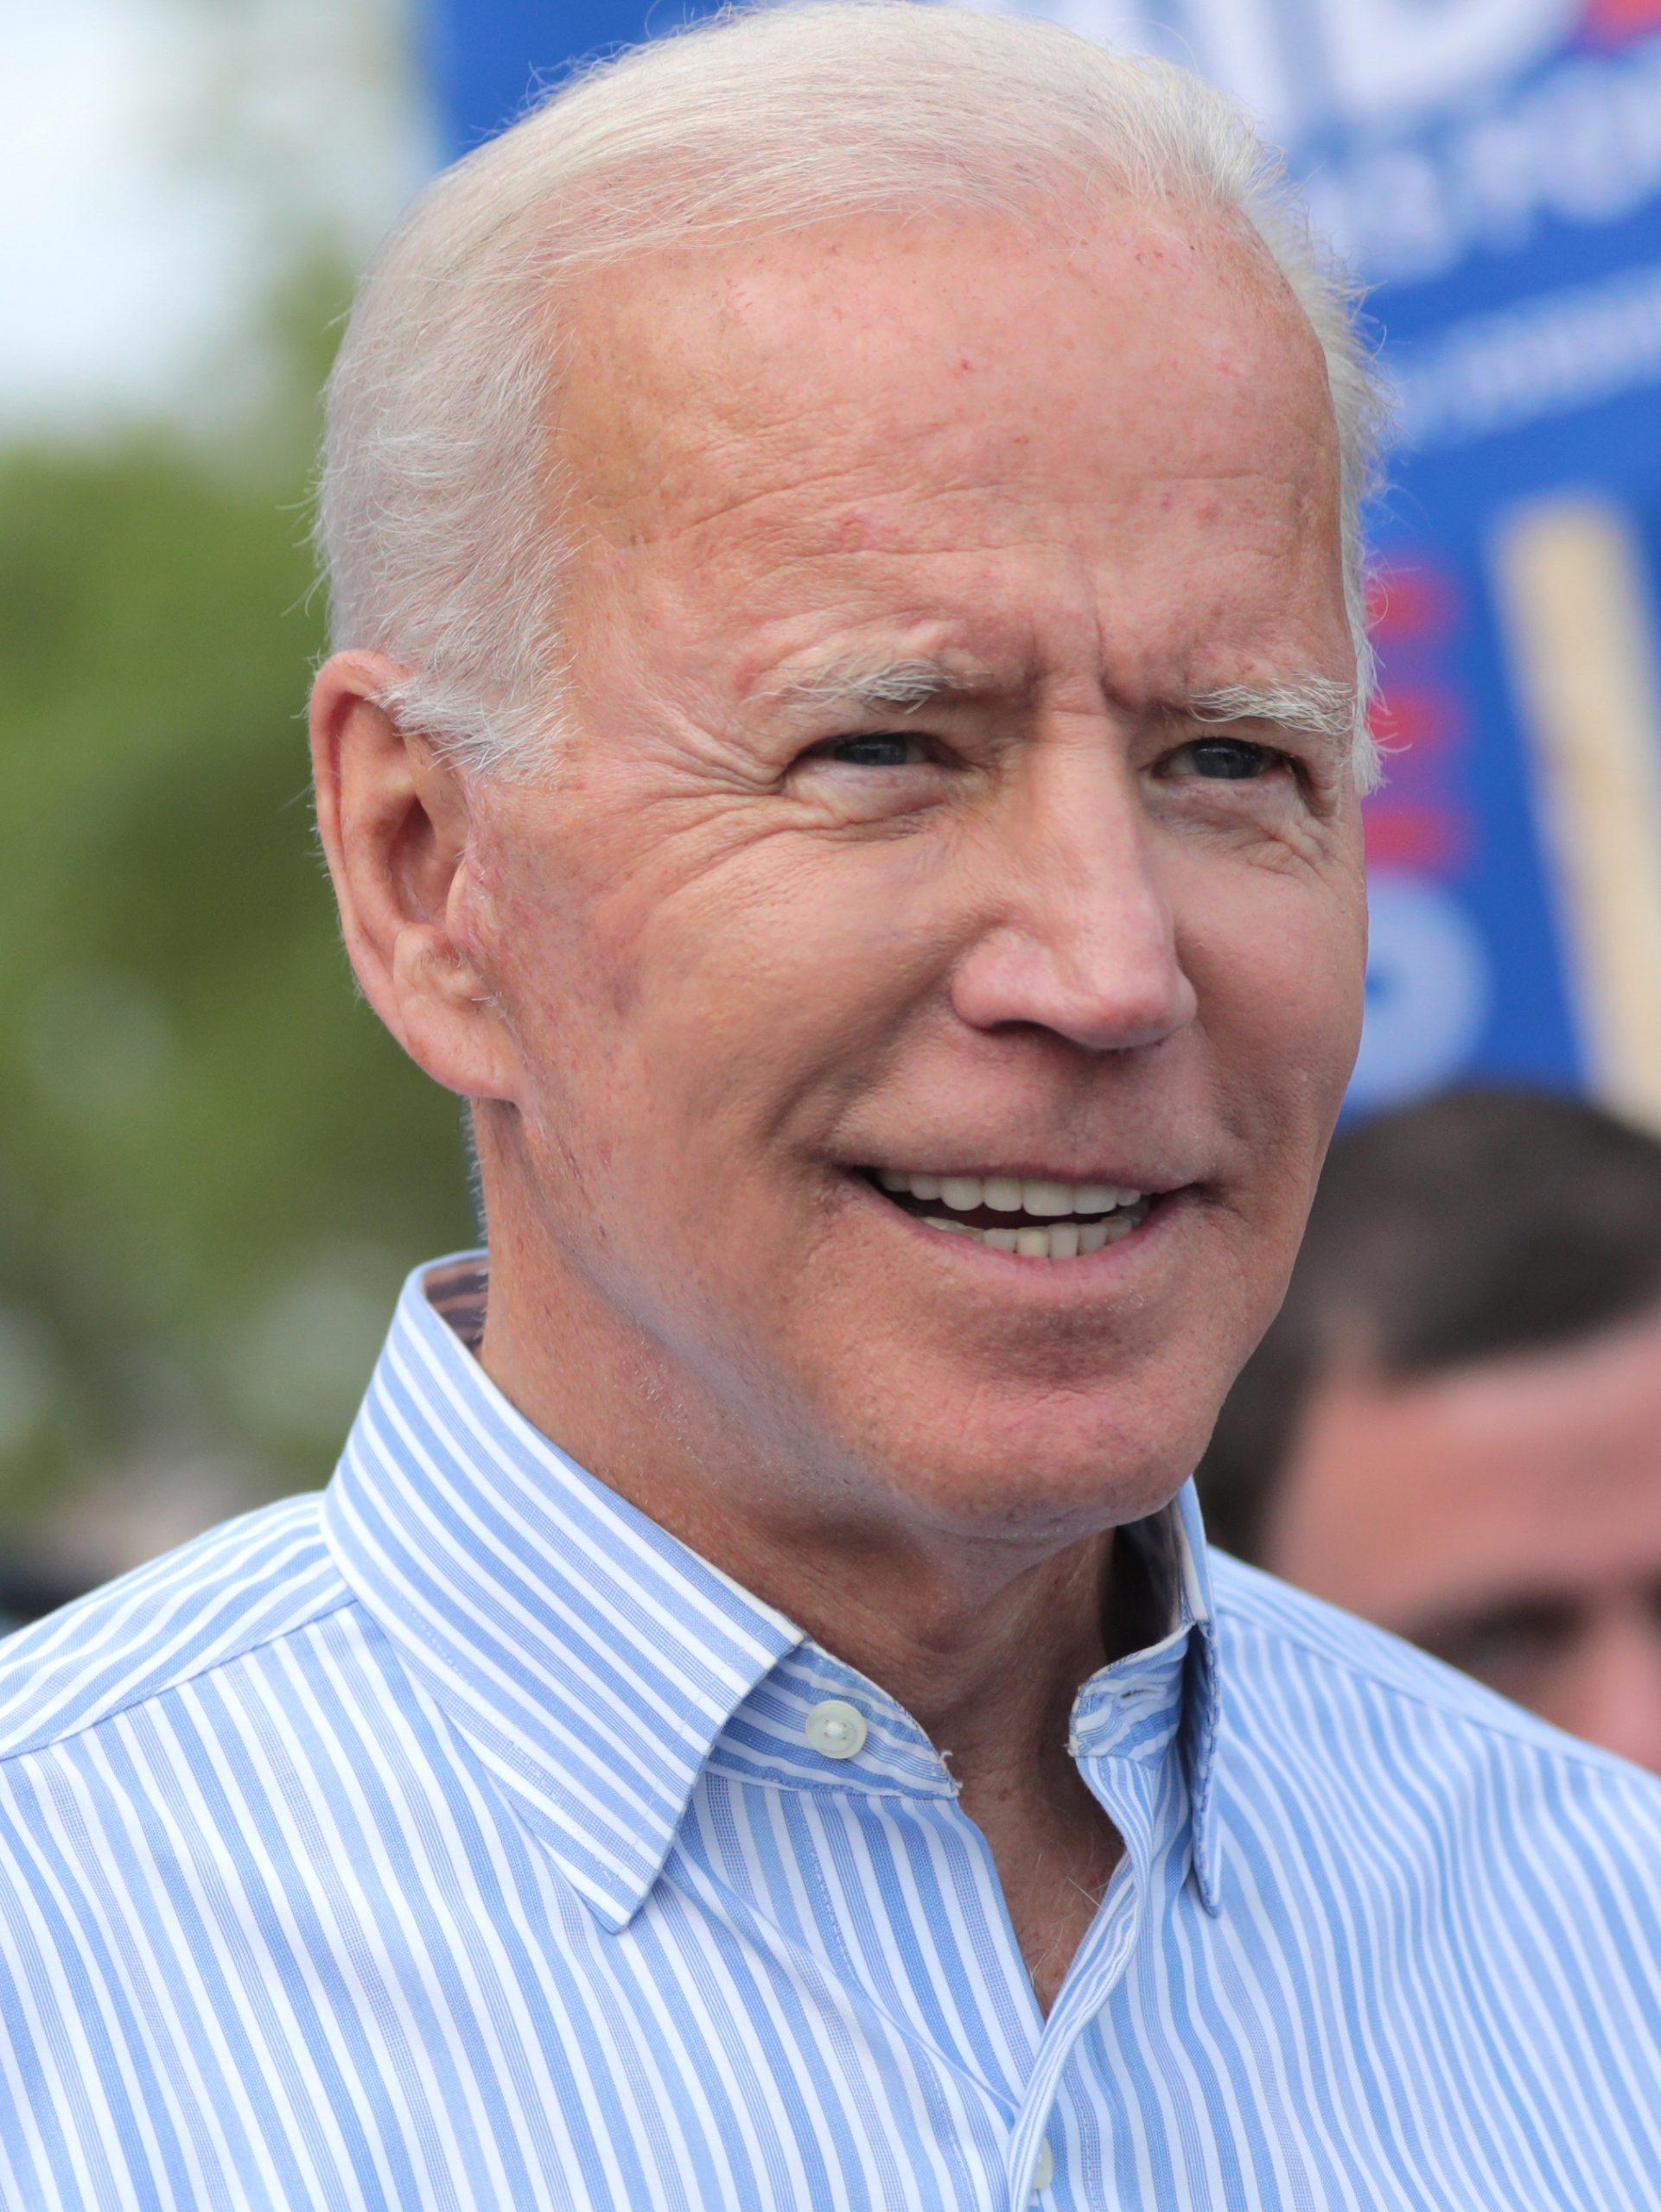 Joe Biden facts